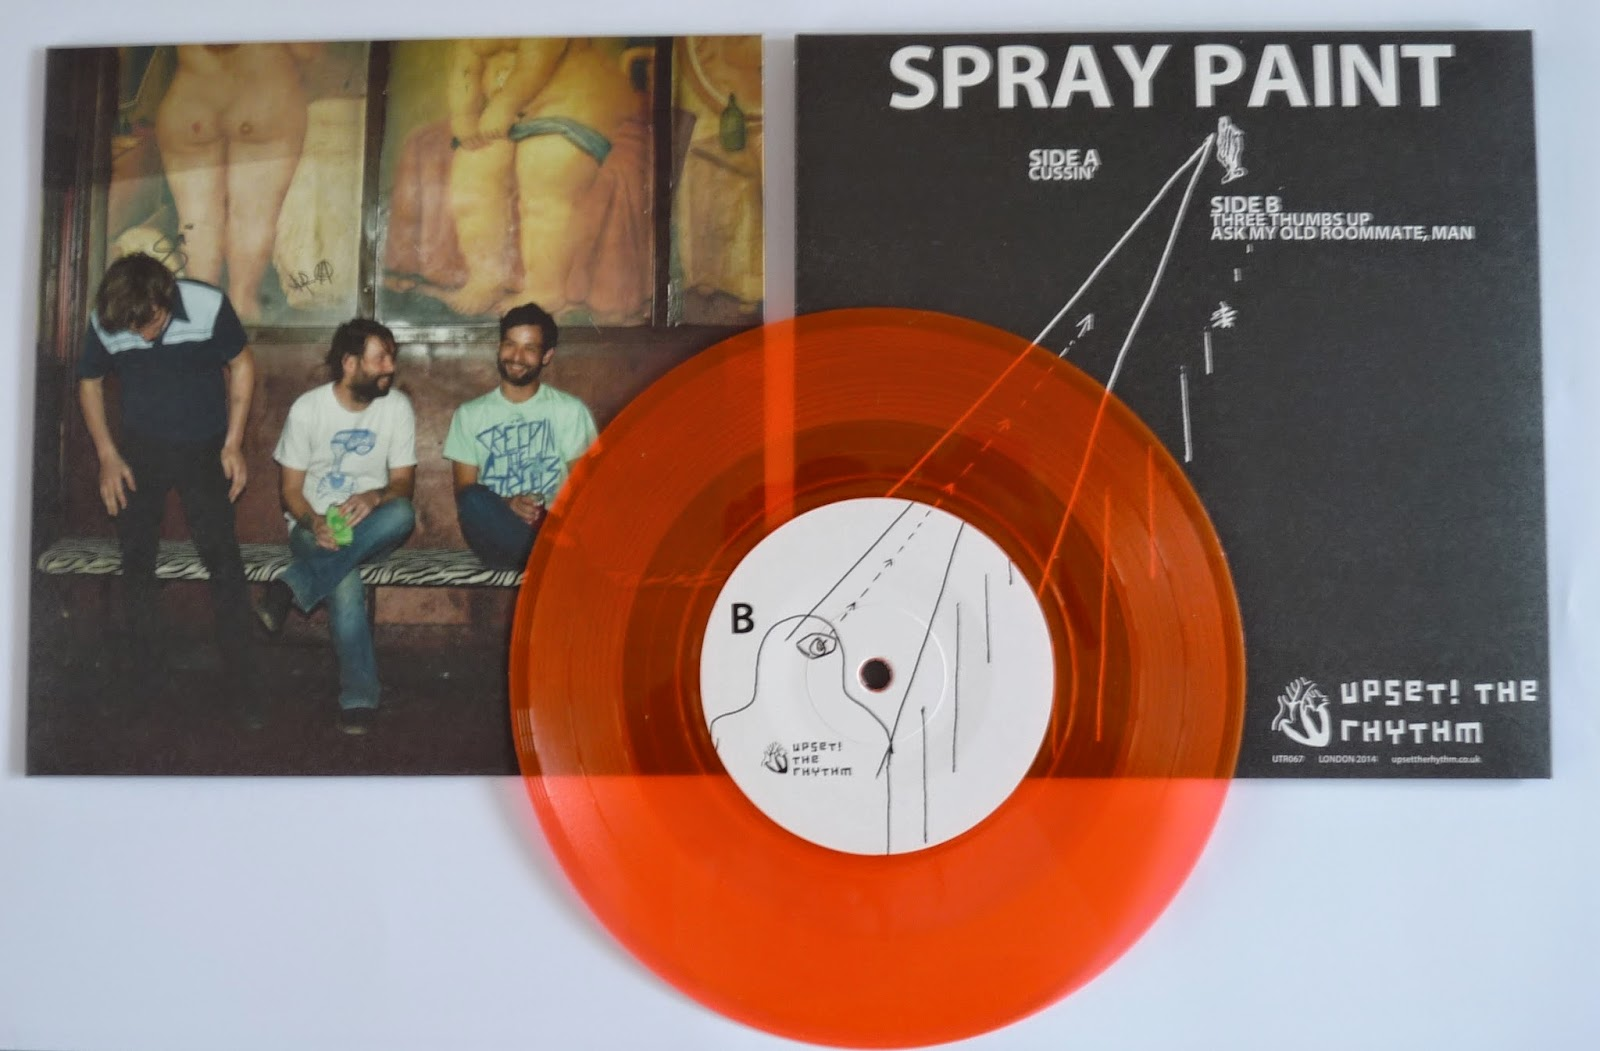 Upset The Rhythm Spray Paint 7 Now In Stock